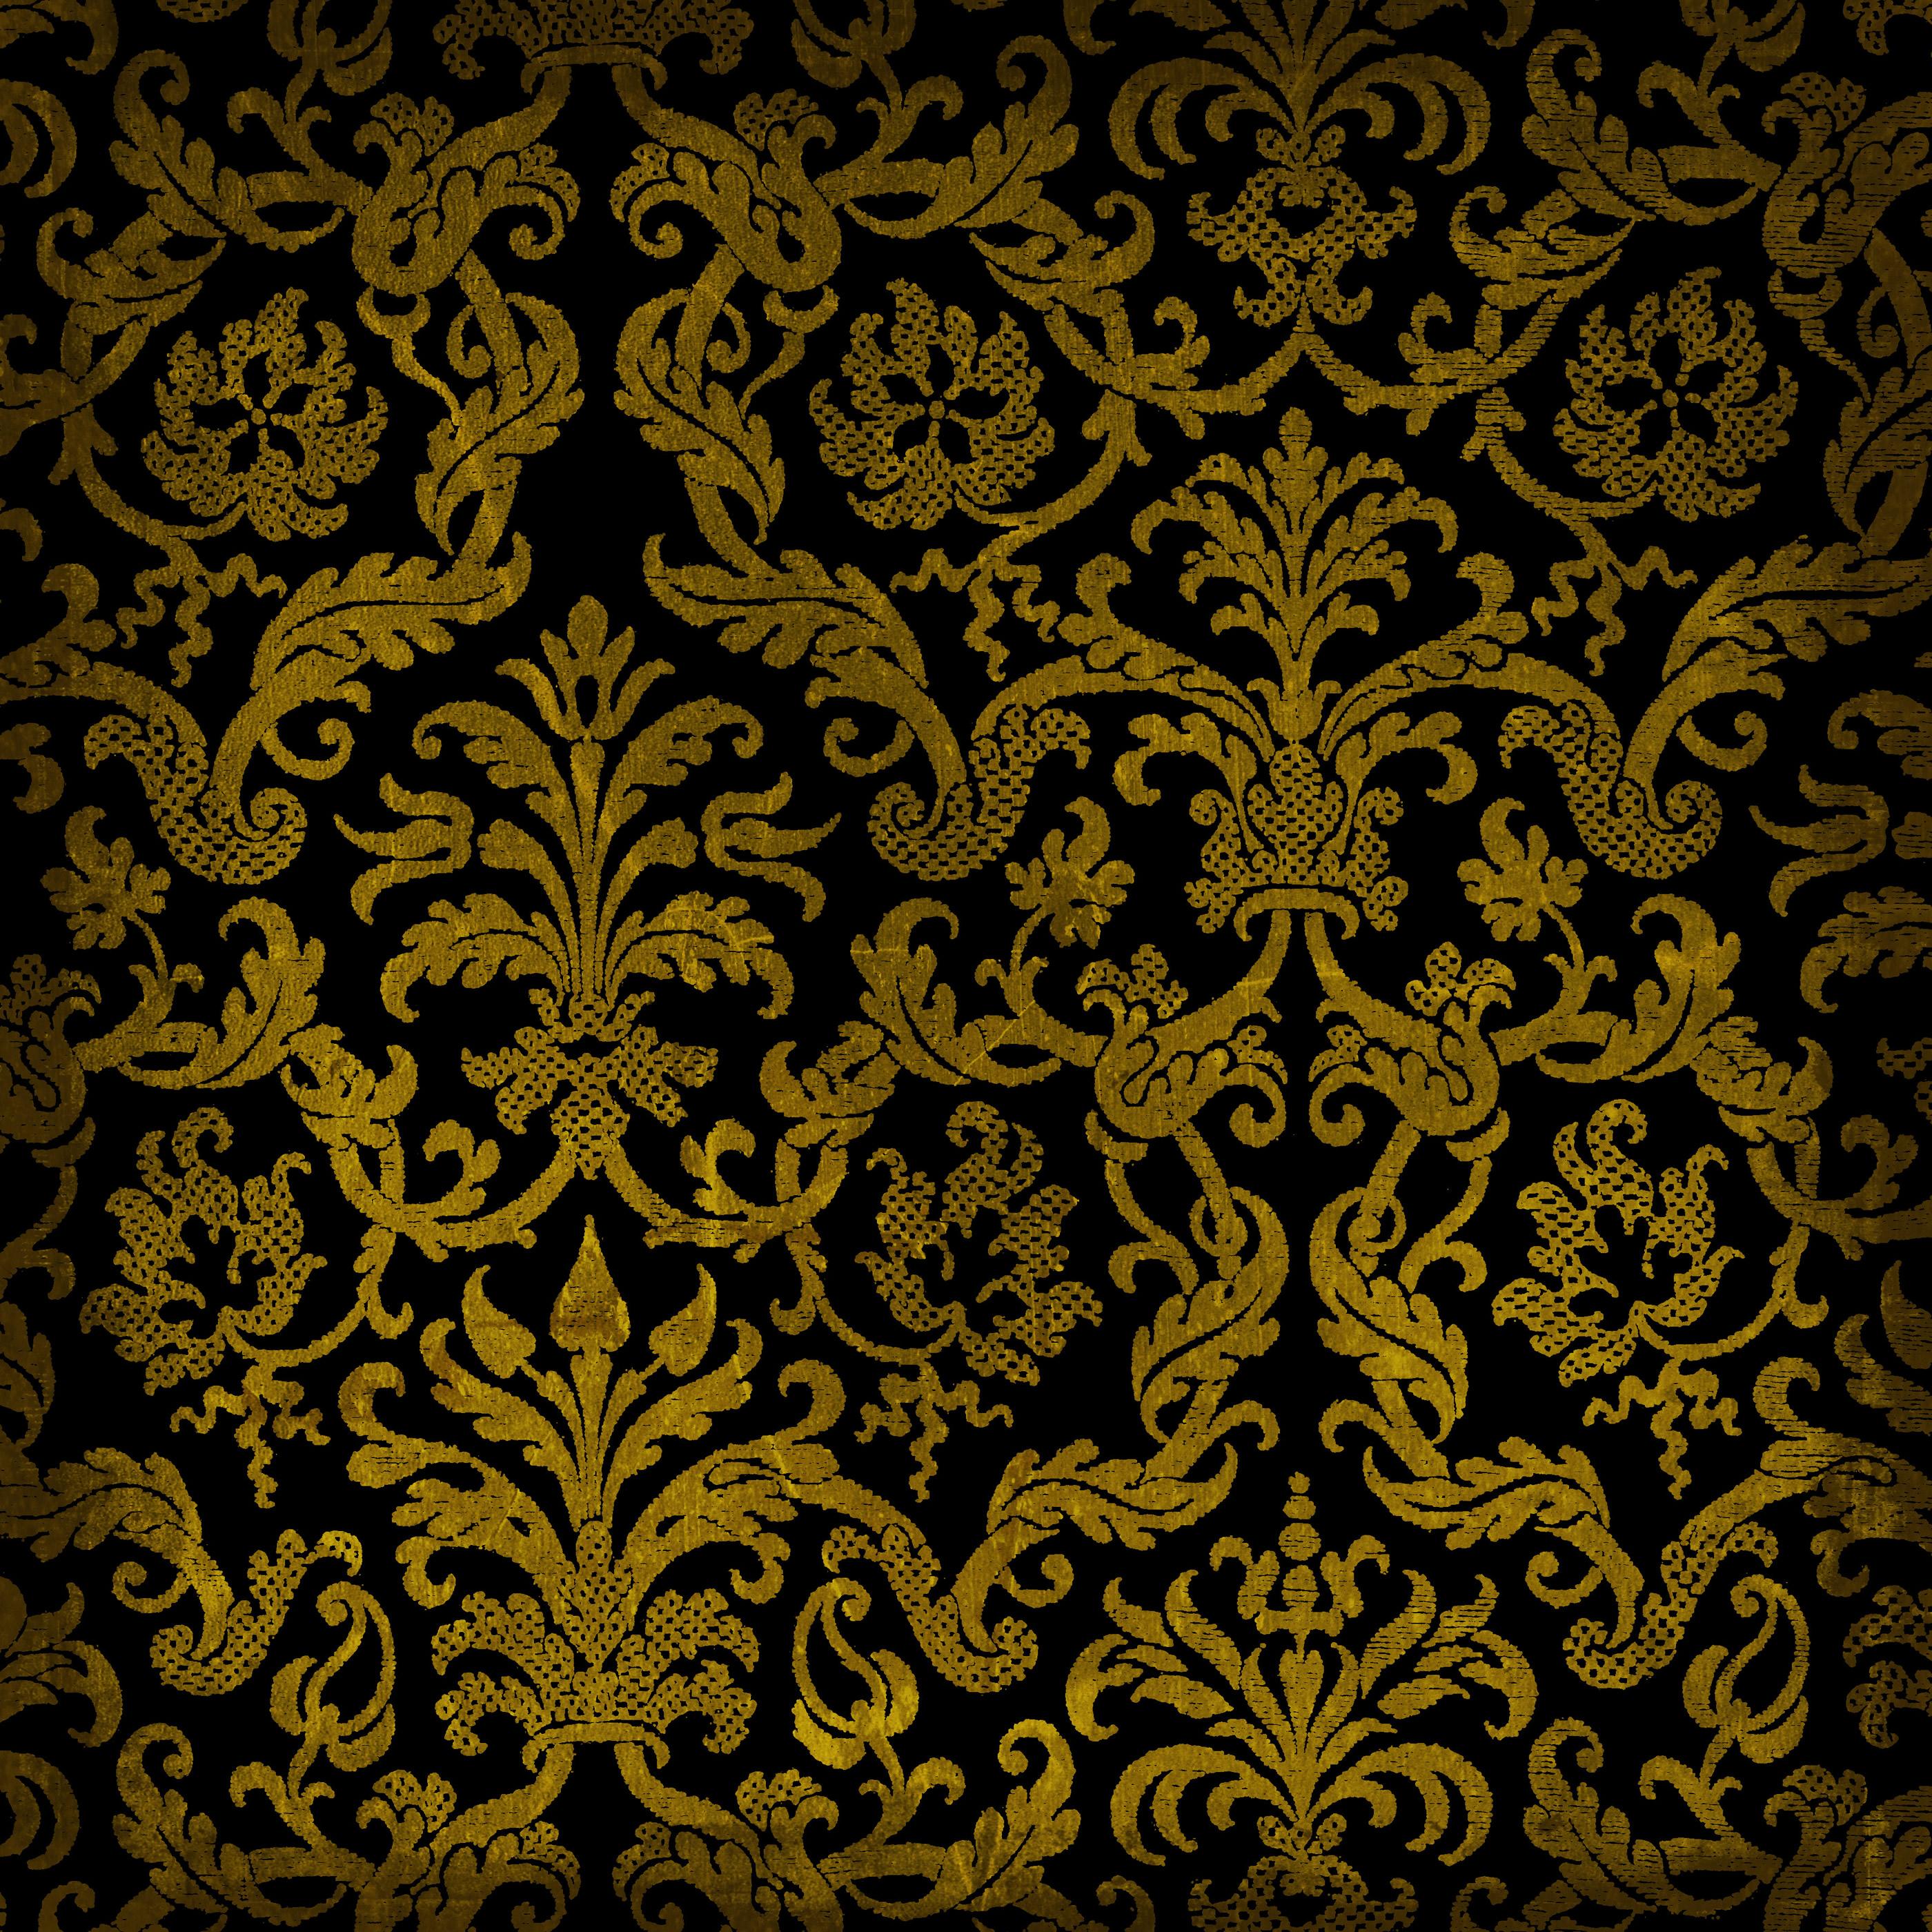 Dark Textures clipart golden texture Download black template background pictures